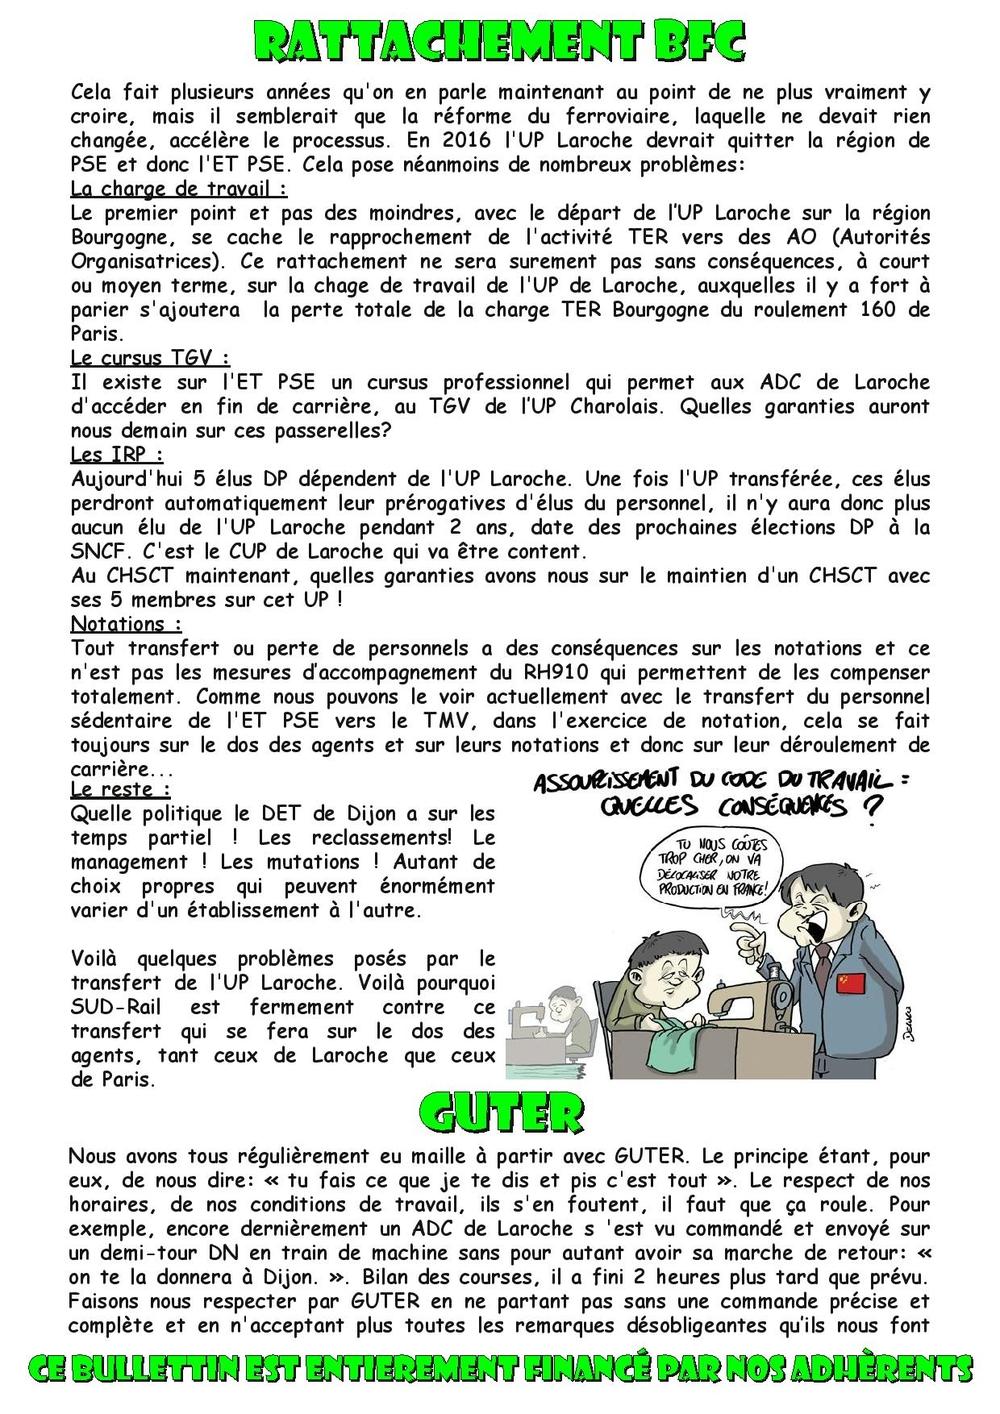 uptlar crdp 03-2016-page-006